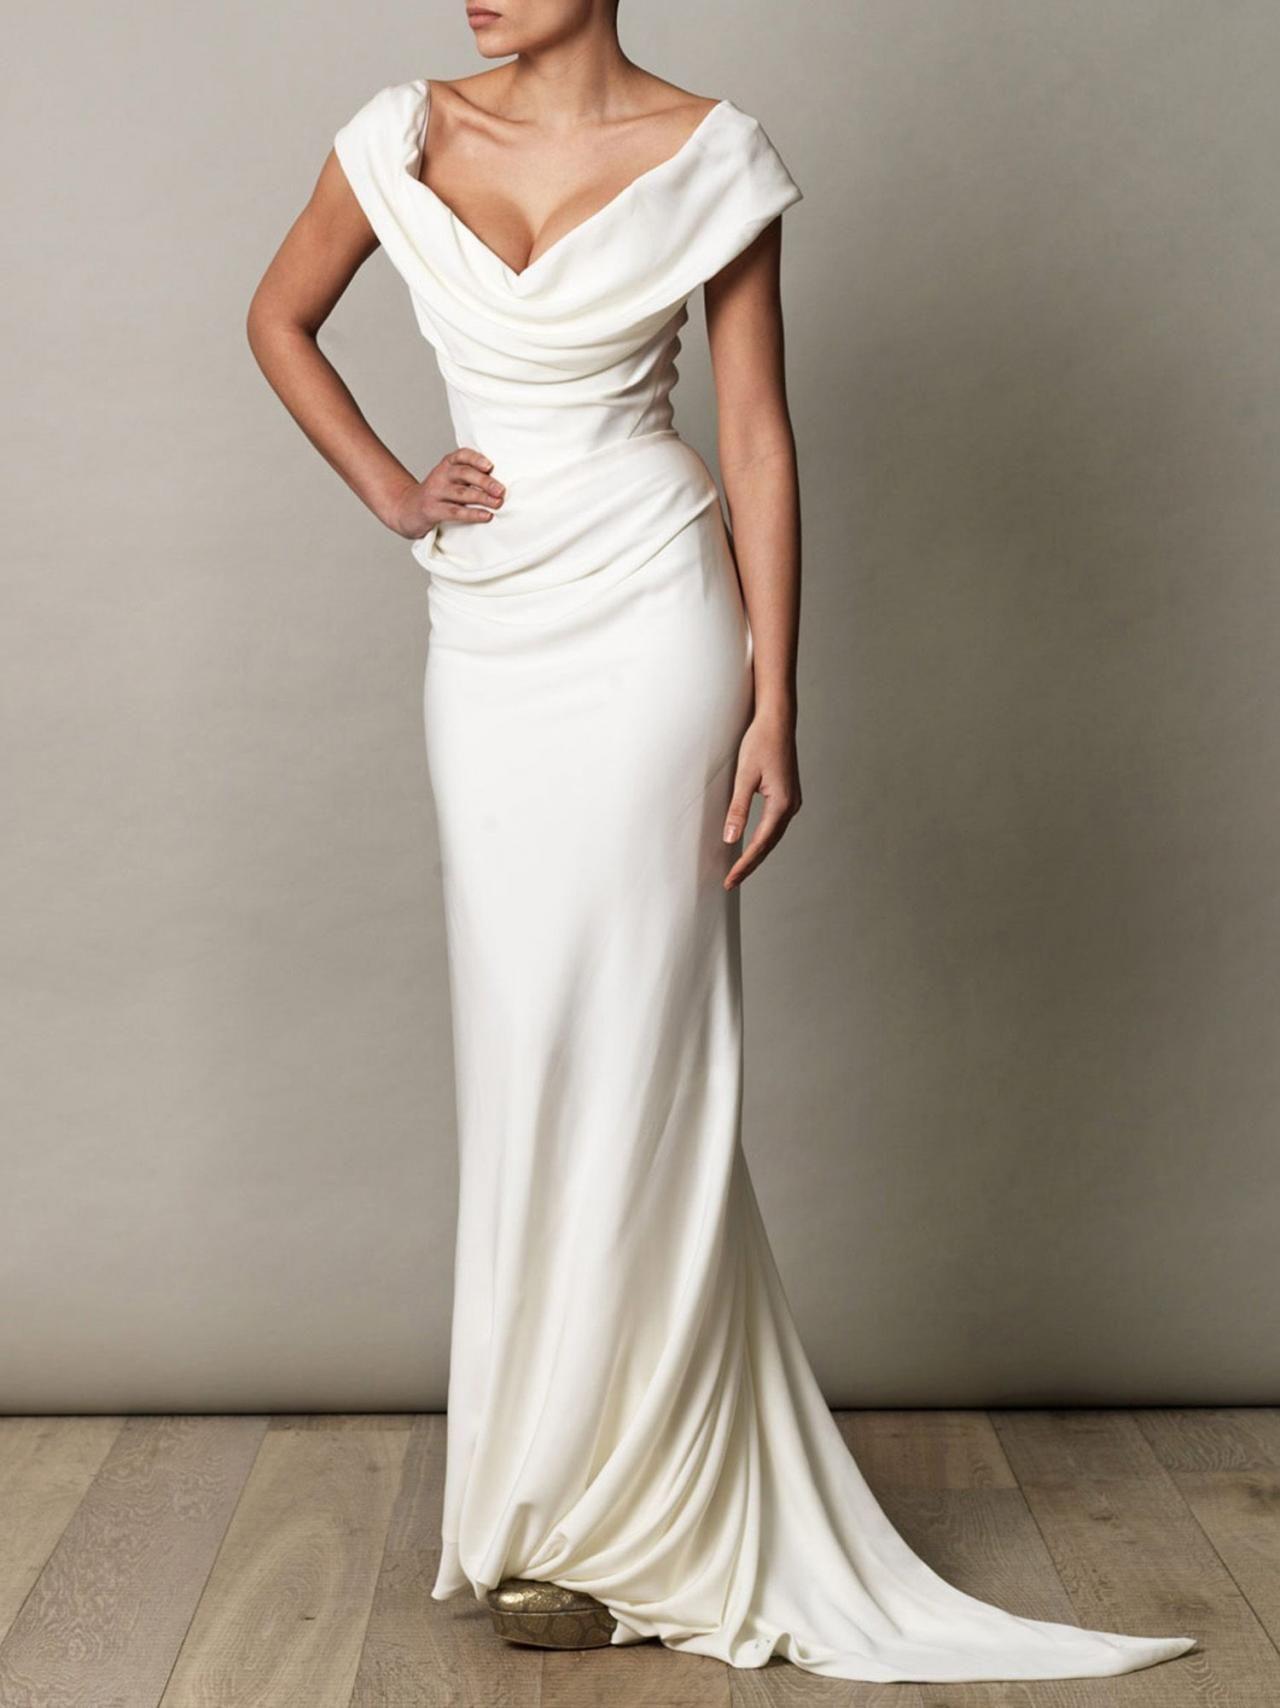 30+ Non white wedding dresses for older brides ideas in 2021